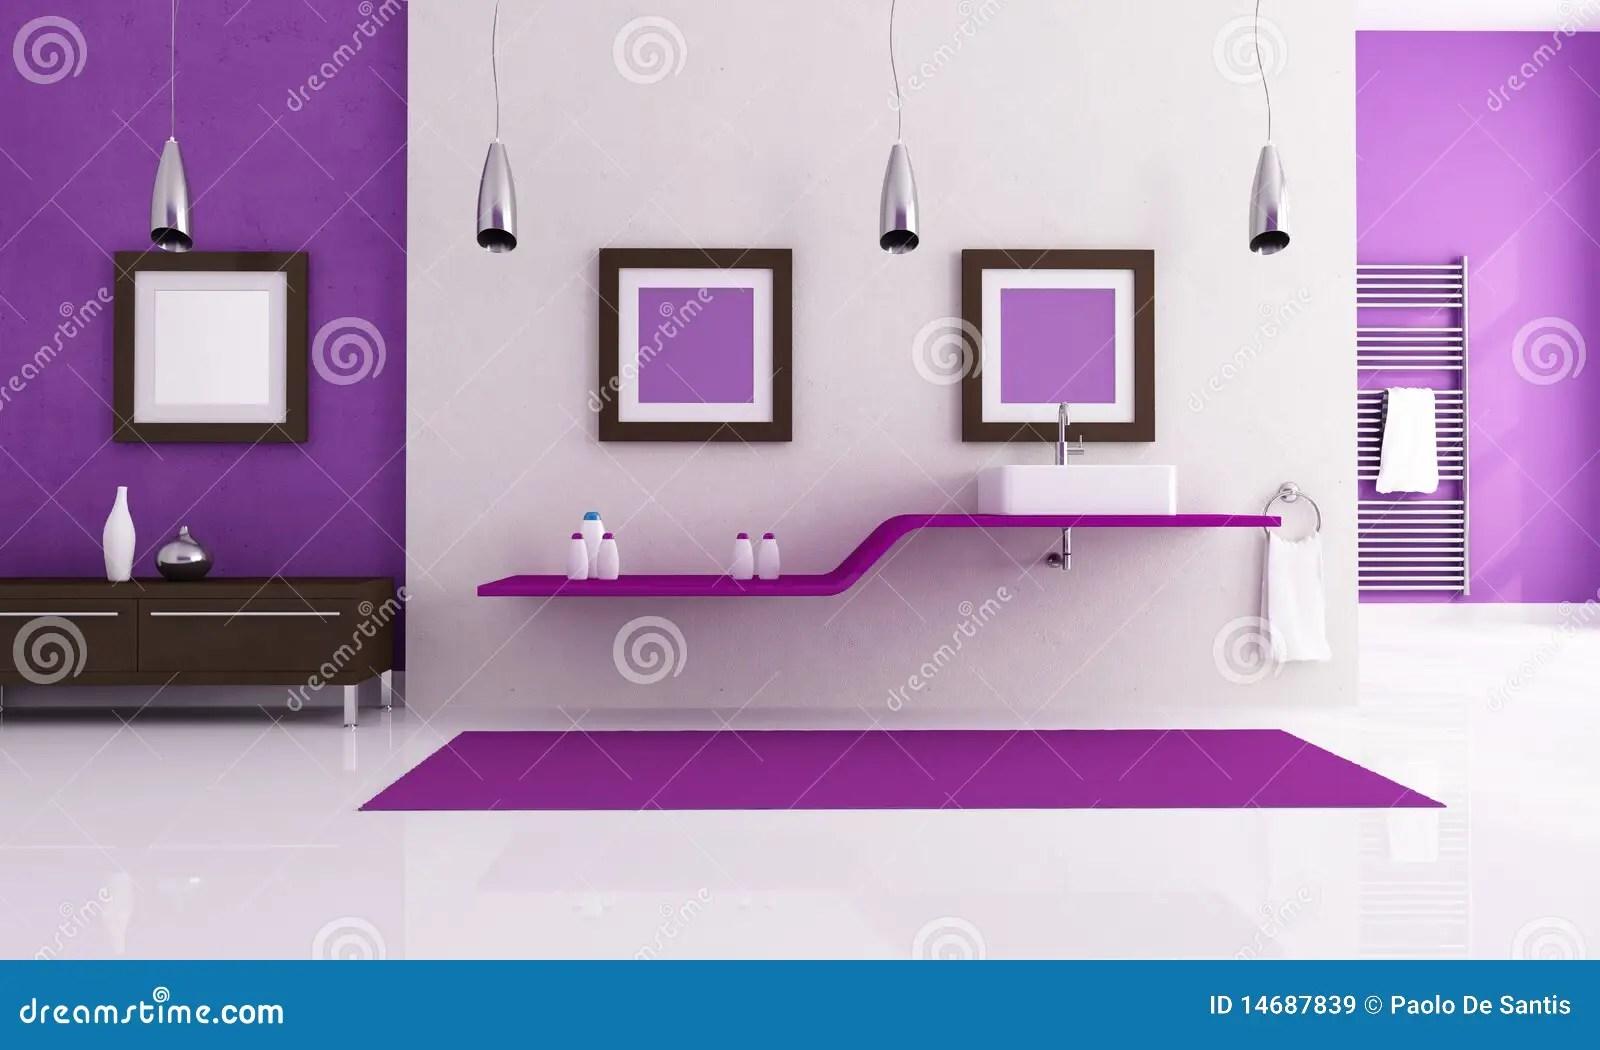 White and purple bathroom stock illustration Image of plaster  14687839